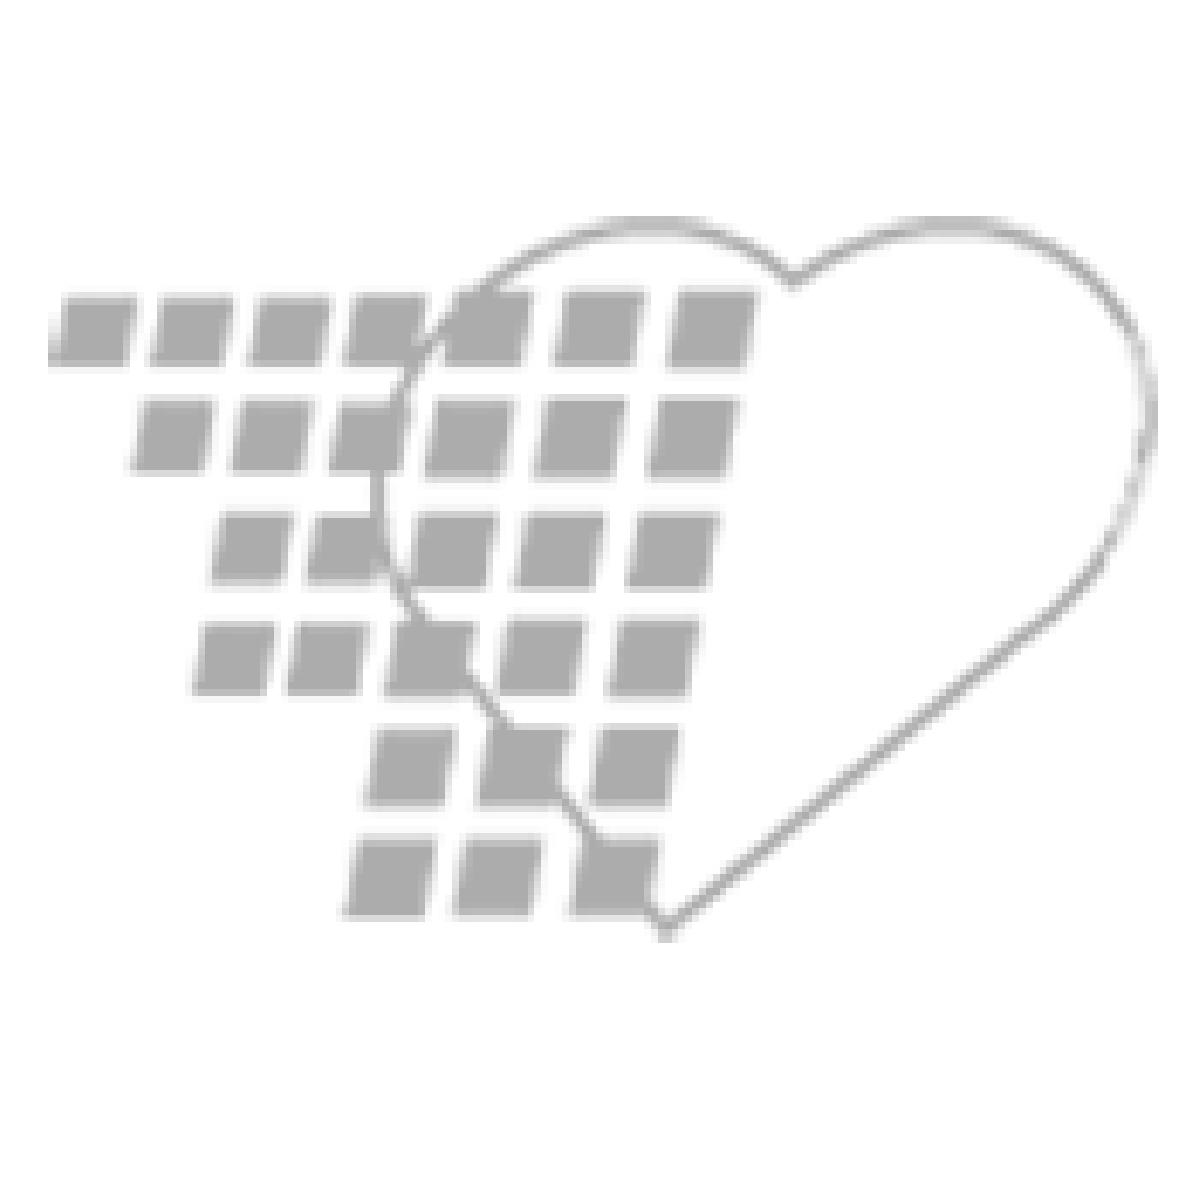 11-94-0151 - Laerdal Integrating SimPad at Customer Site